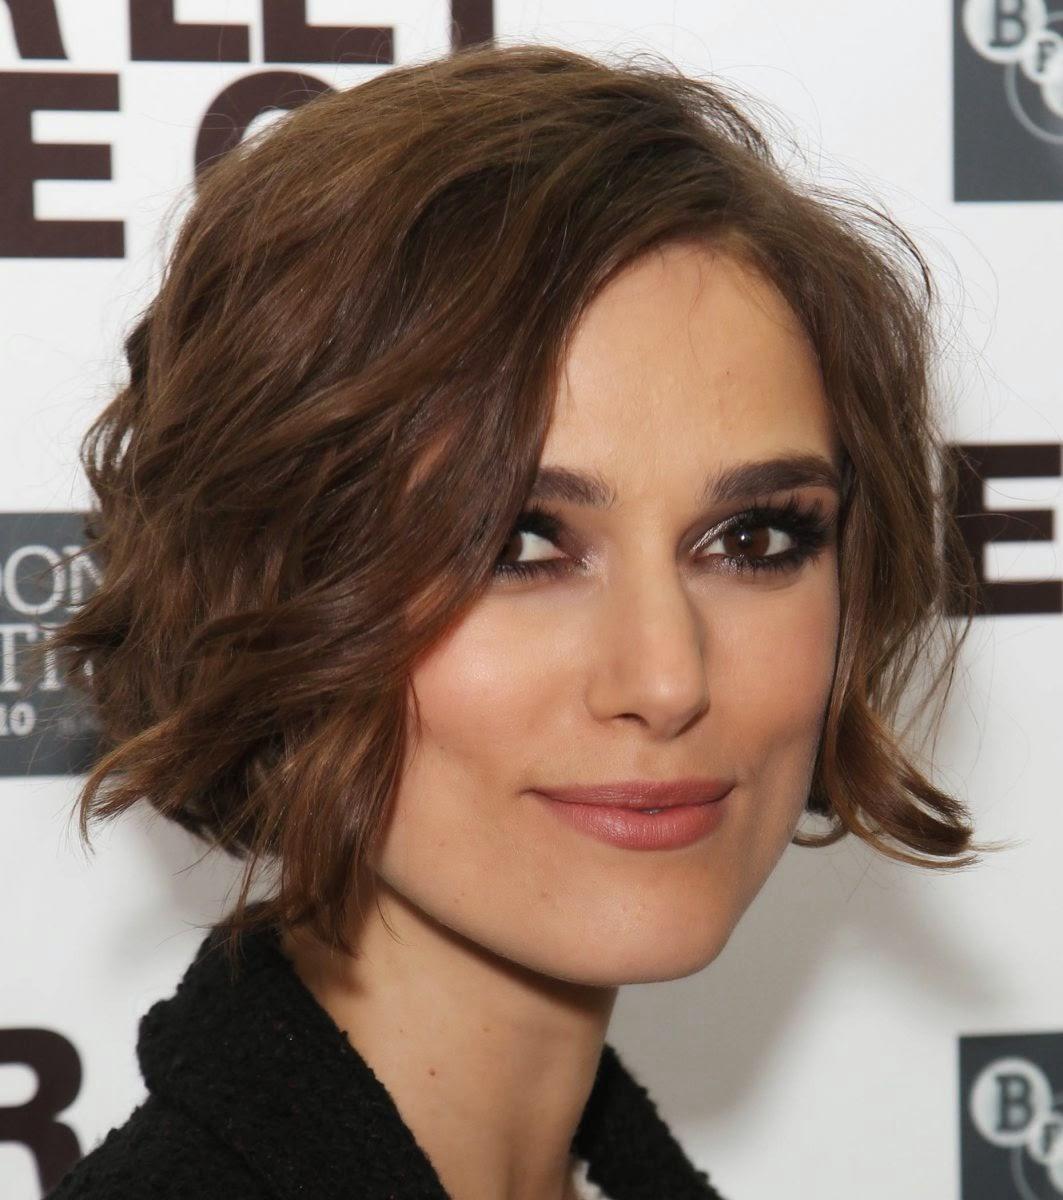 model rambut wanita berwajah bulat 2017 contoh model rambut wanita